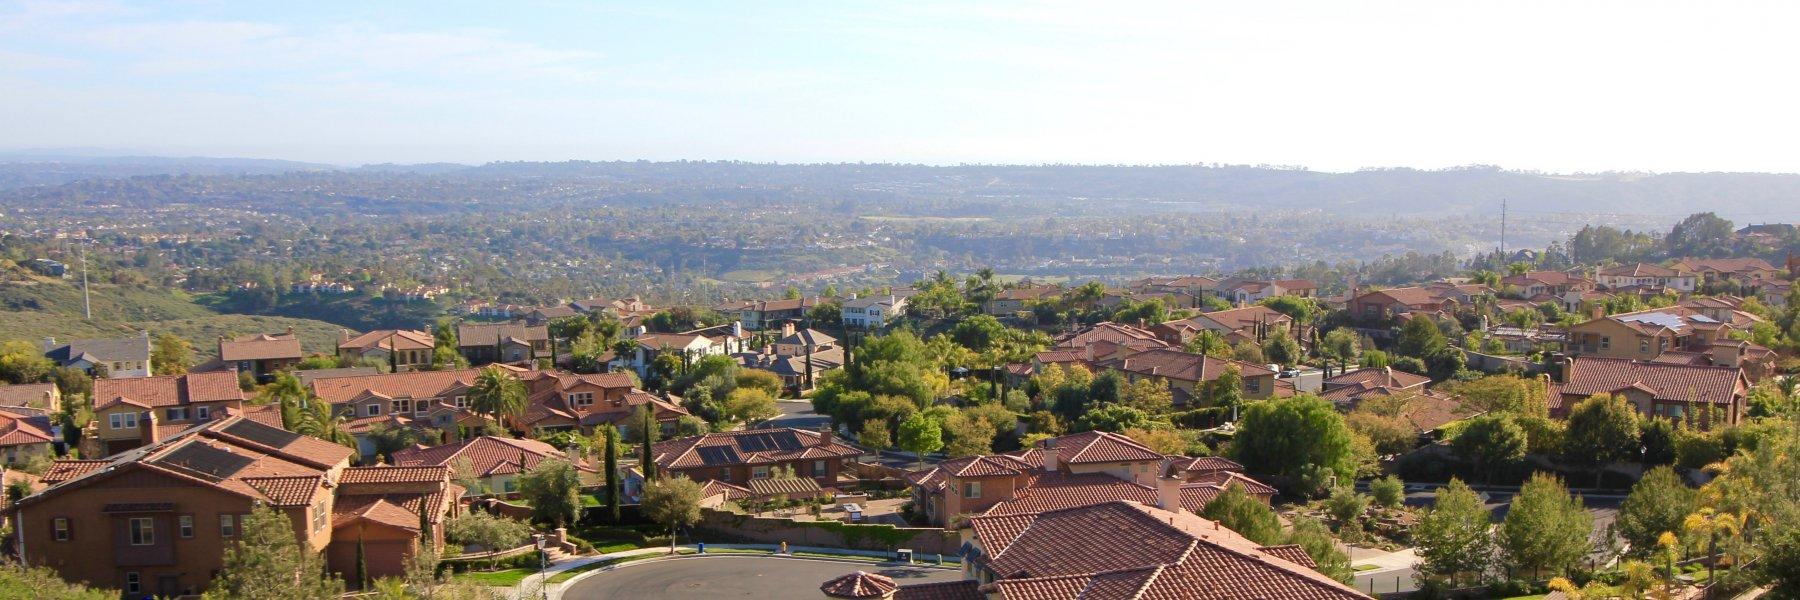 La Costa Ridge is a community of homes in Carlsbad California